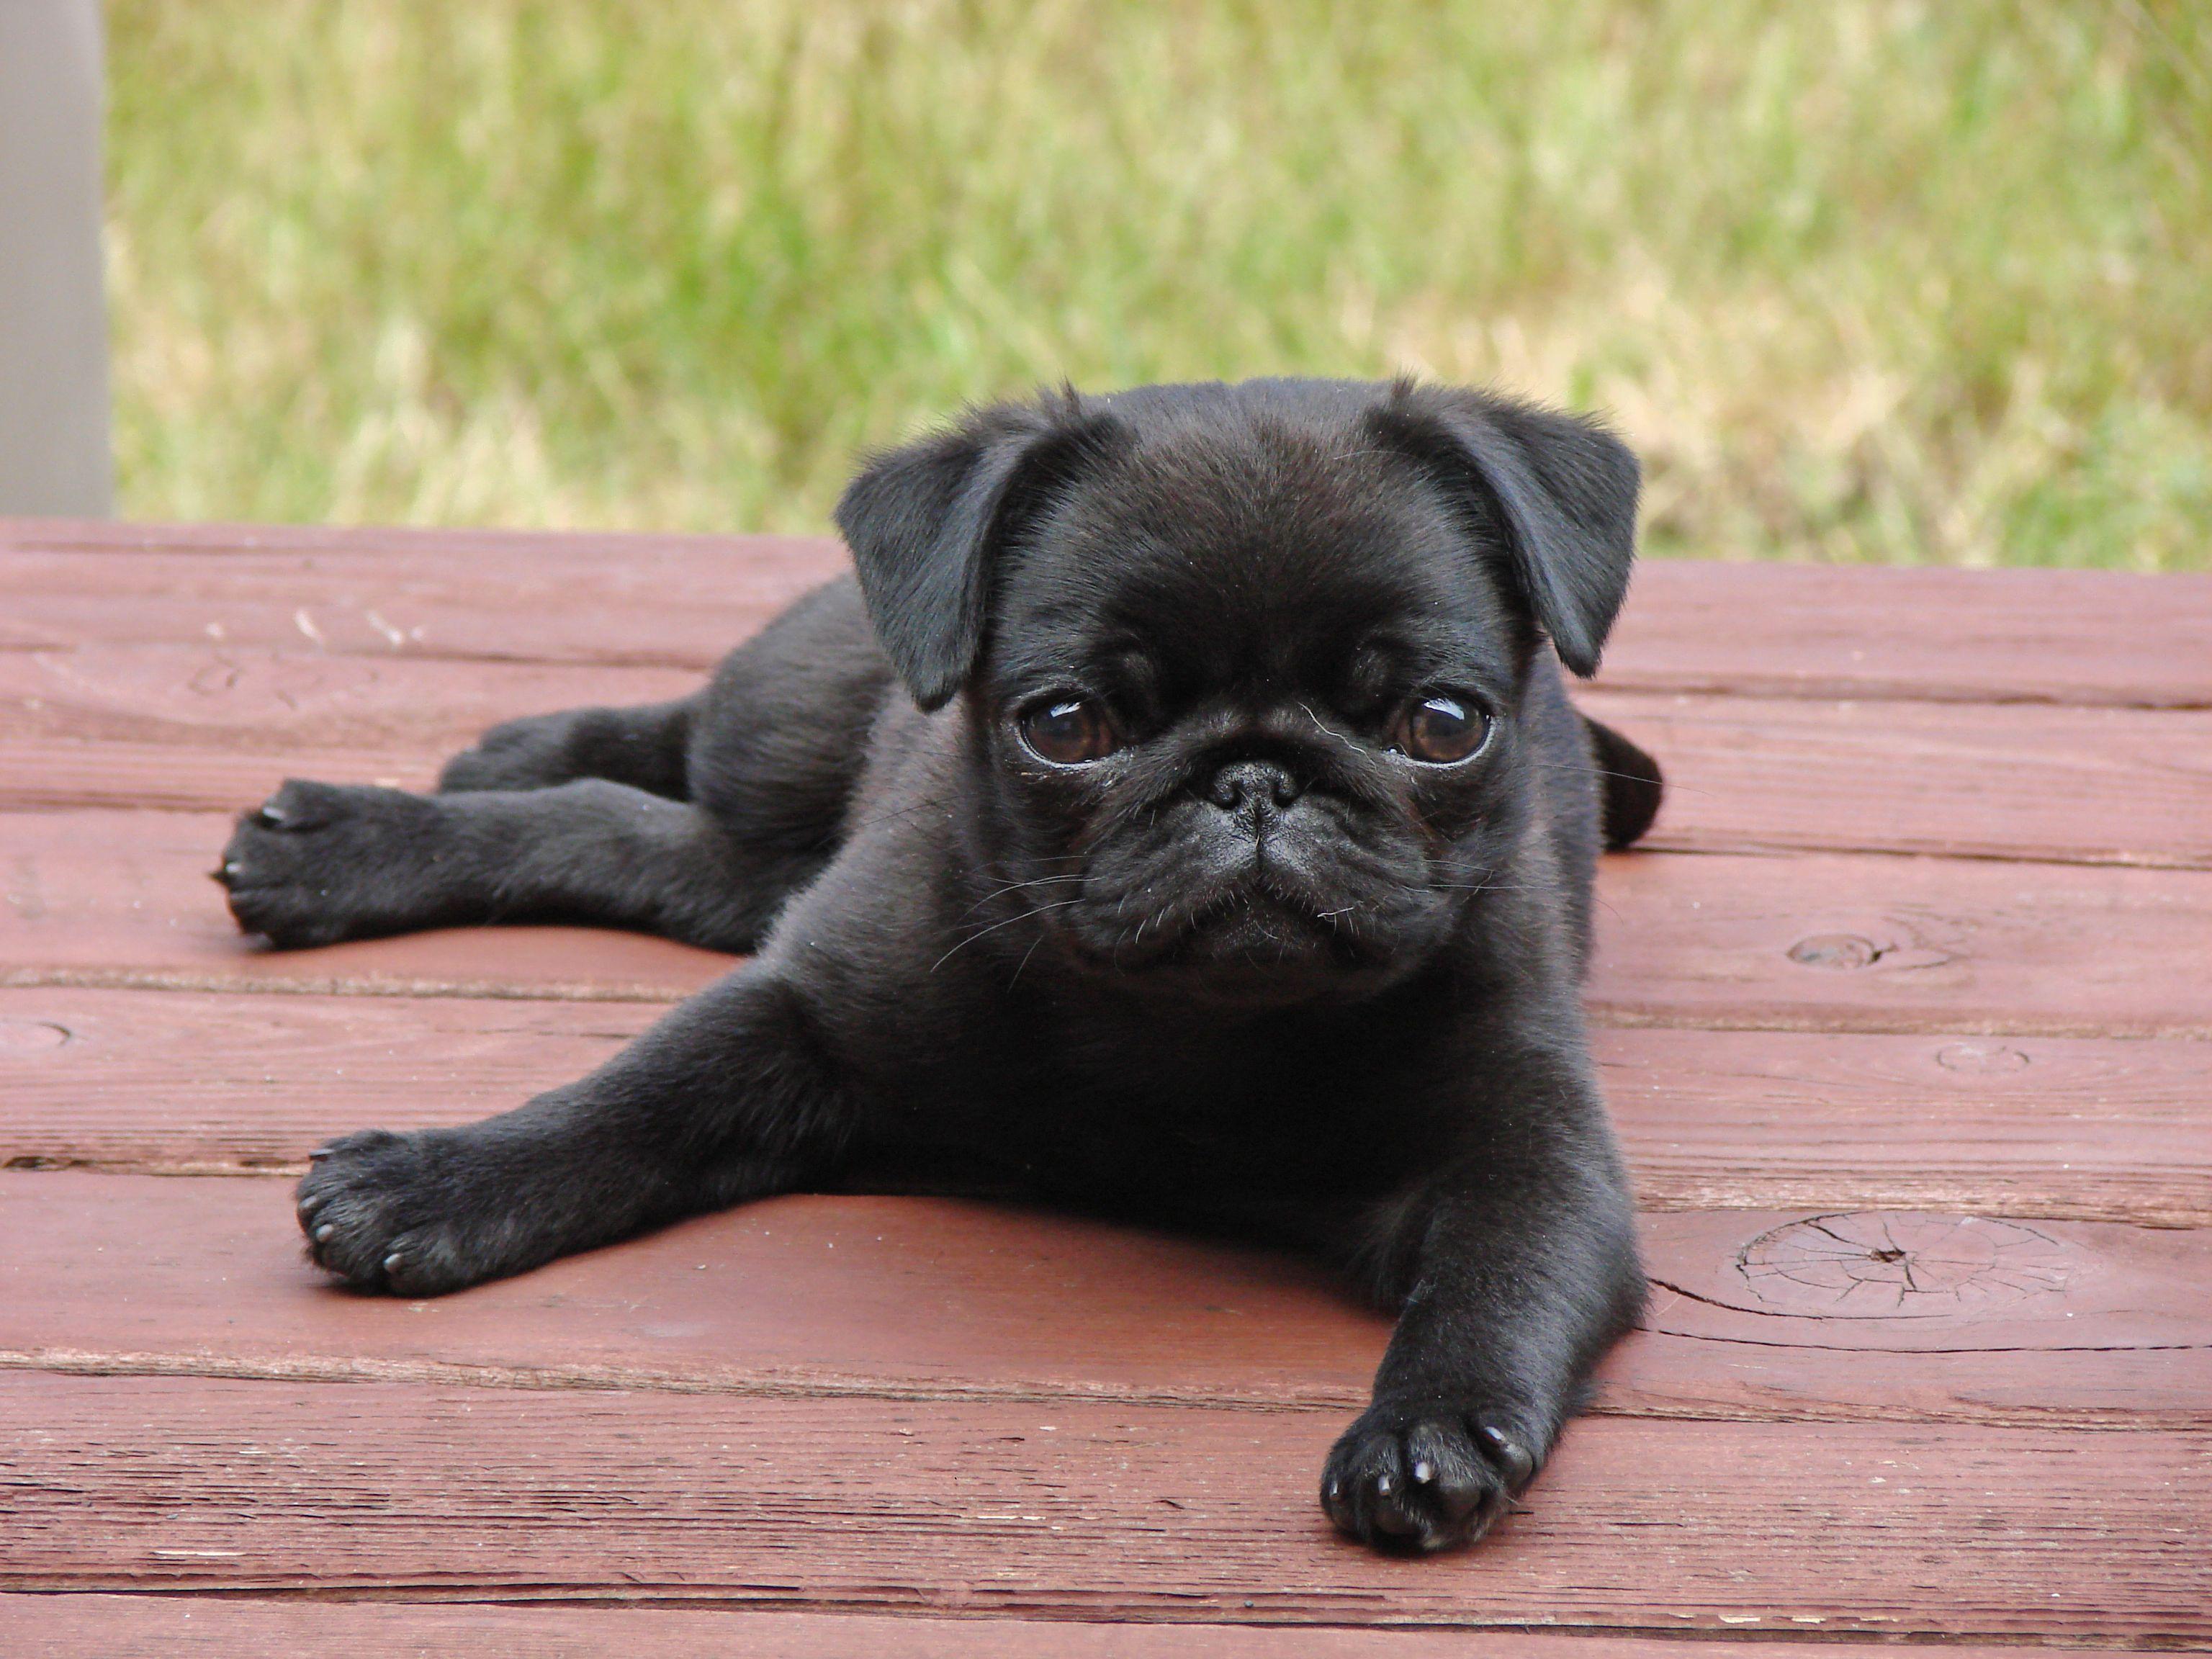 Black Pug Full Grown Wallpaper 3 Jpg 3072 2304 Cute Pugs Cute